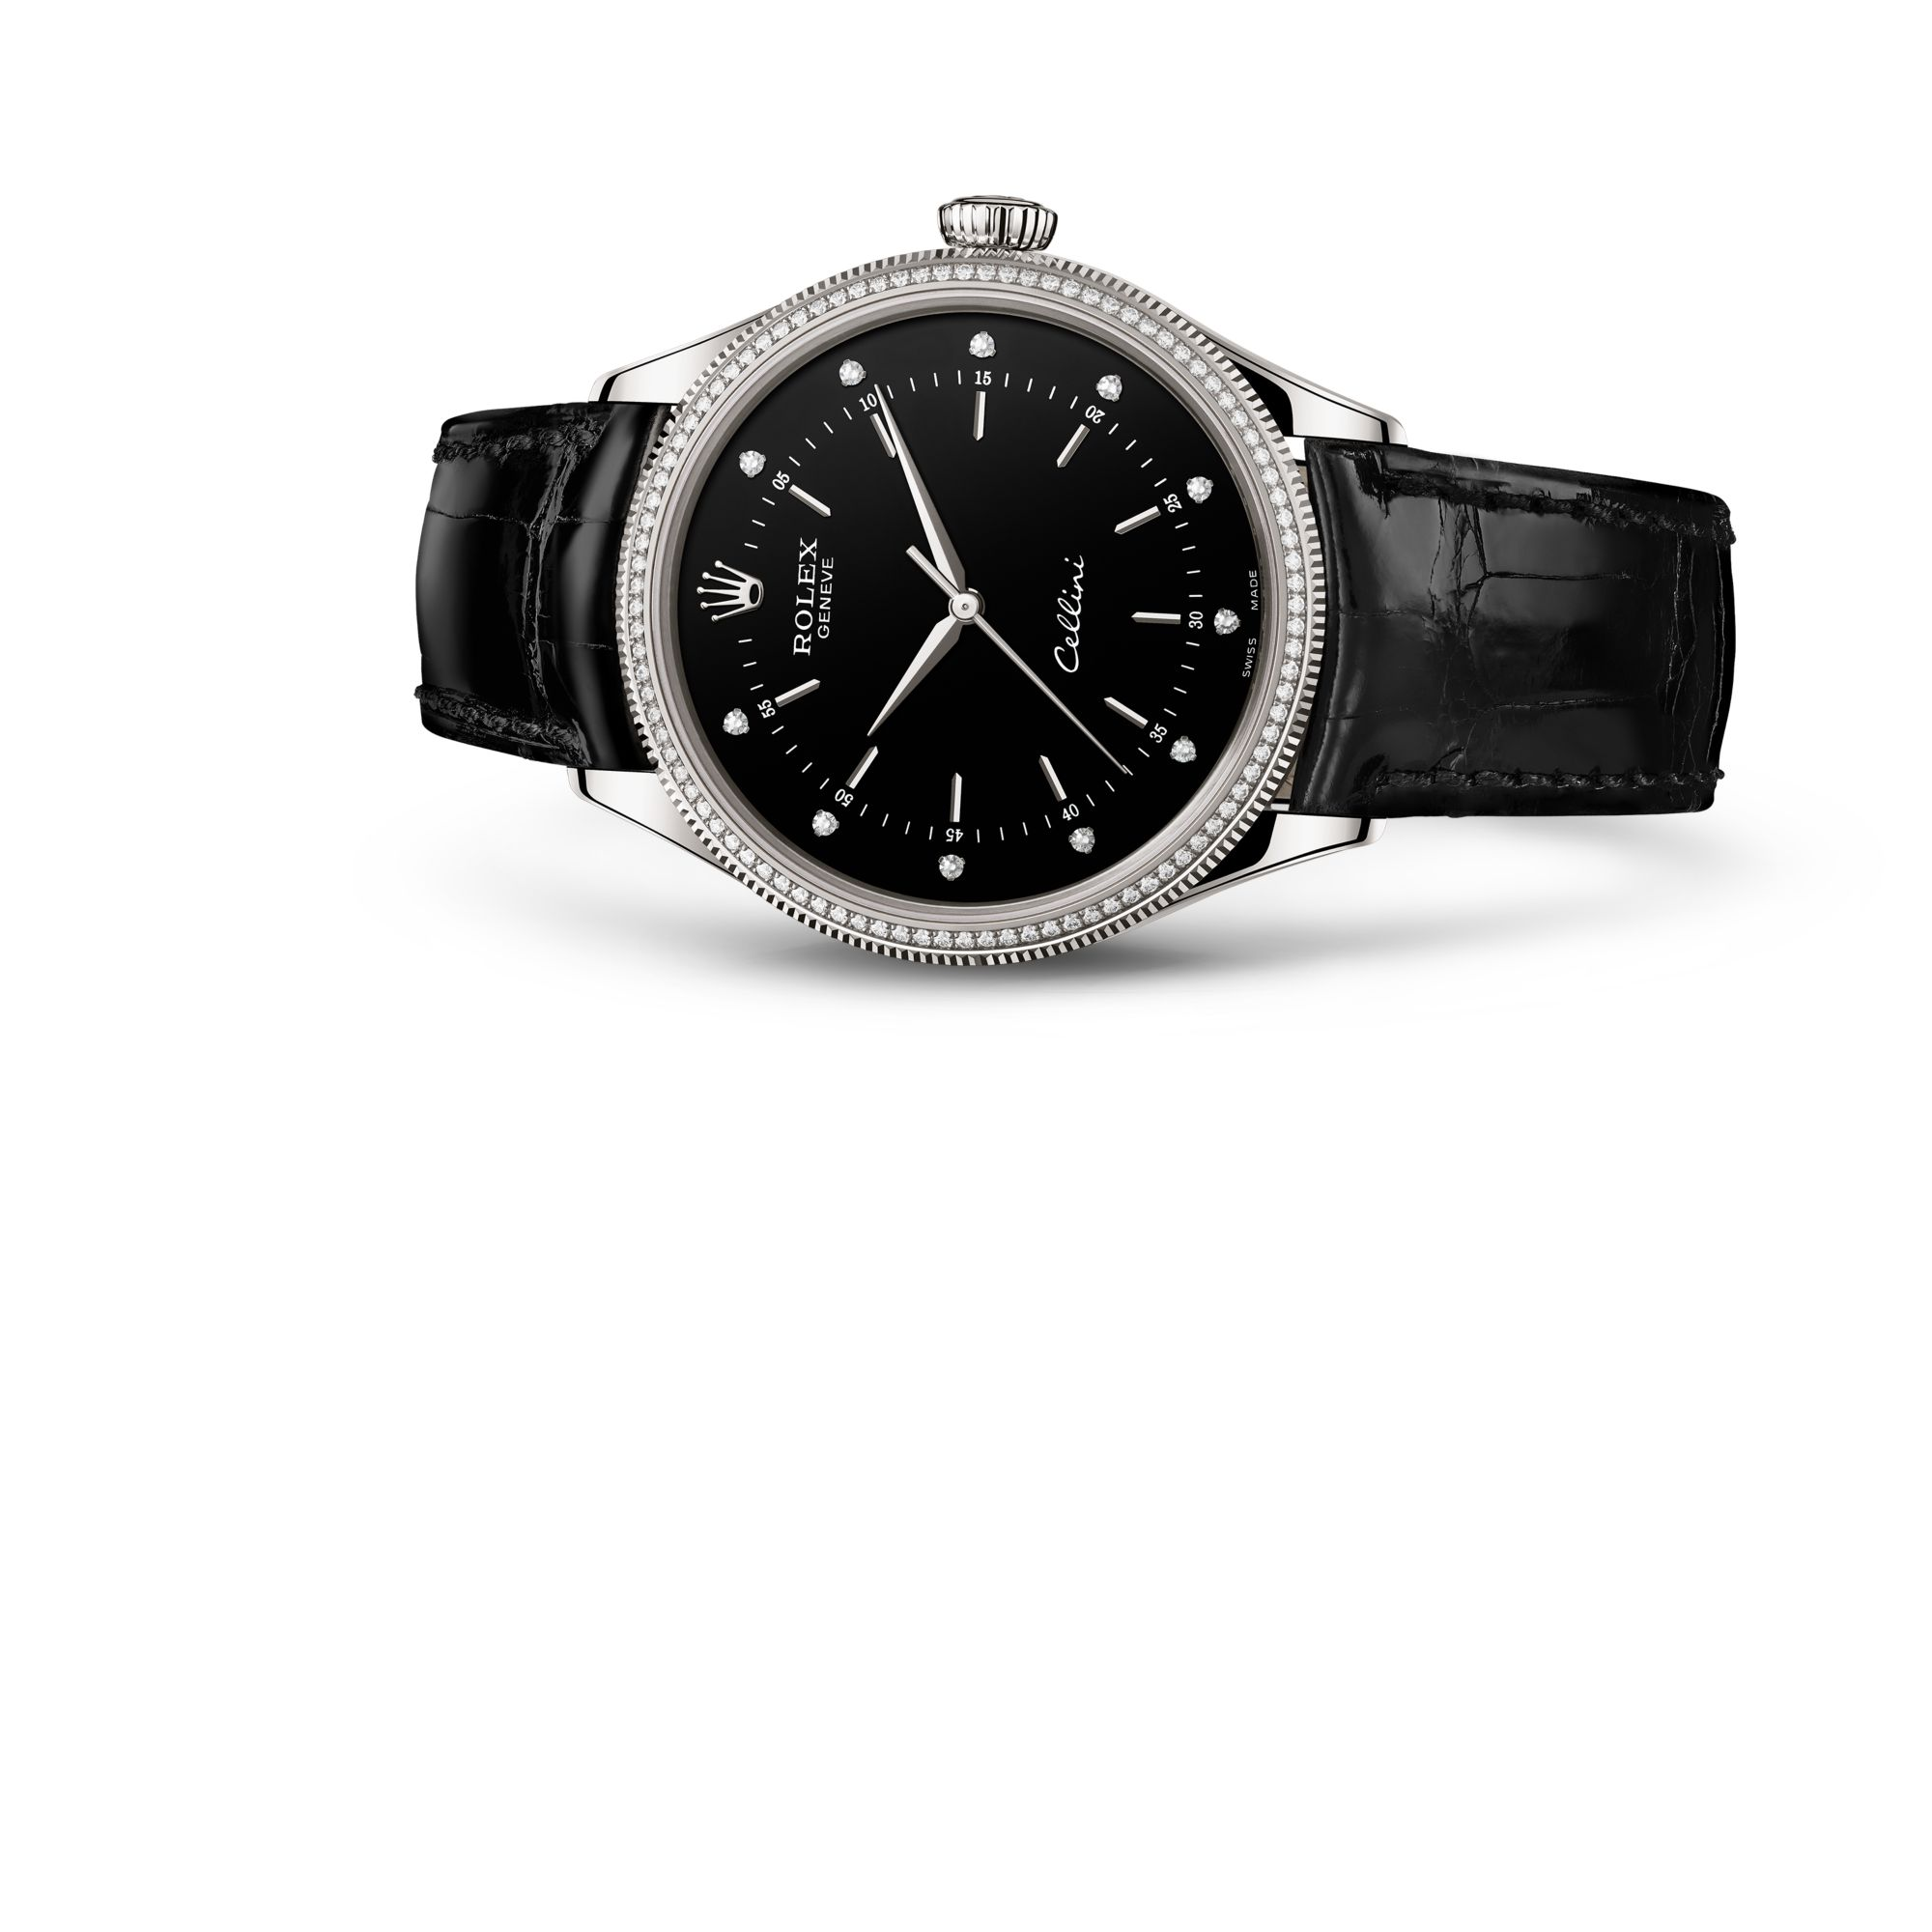 Rolex Cellini Time M50609RBR-0007